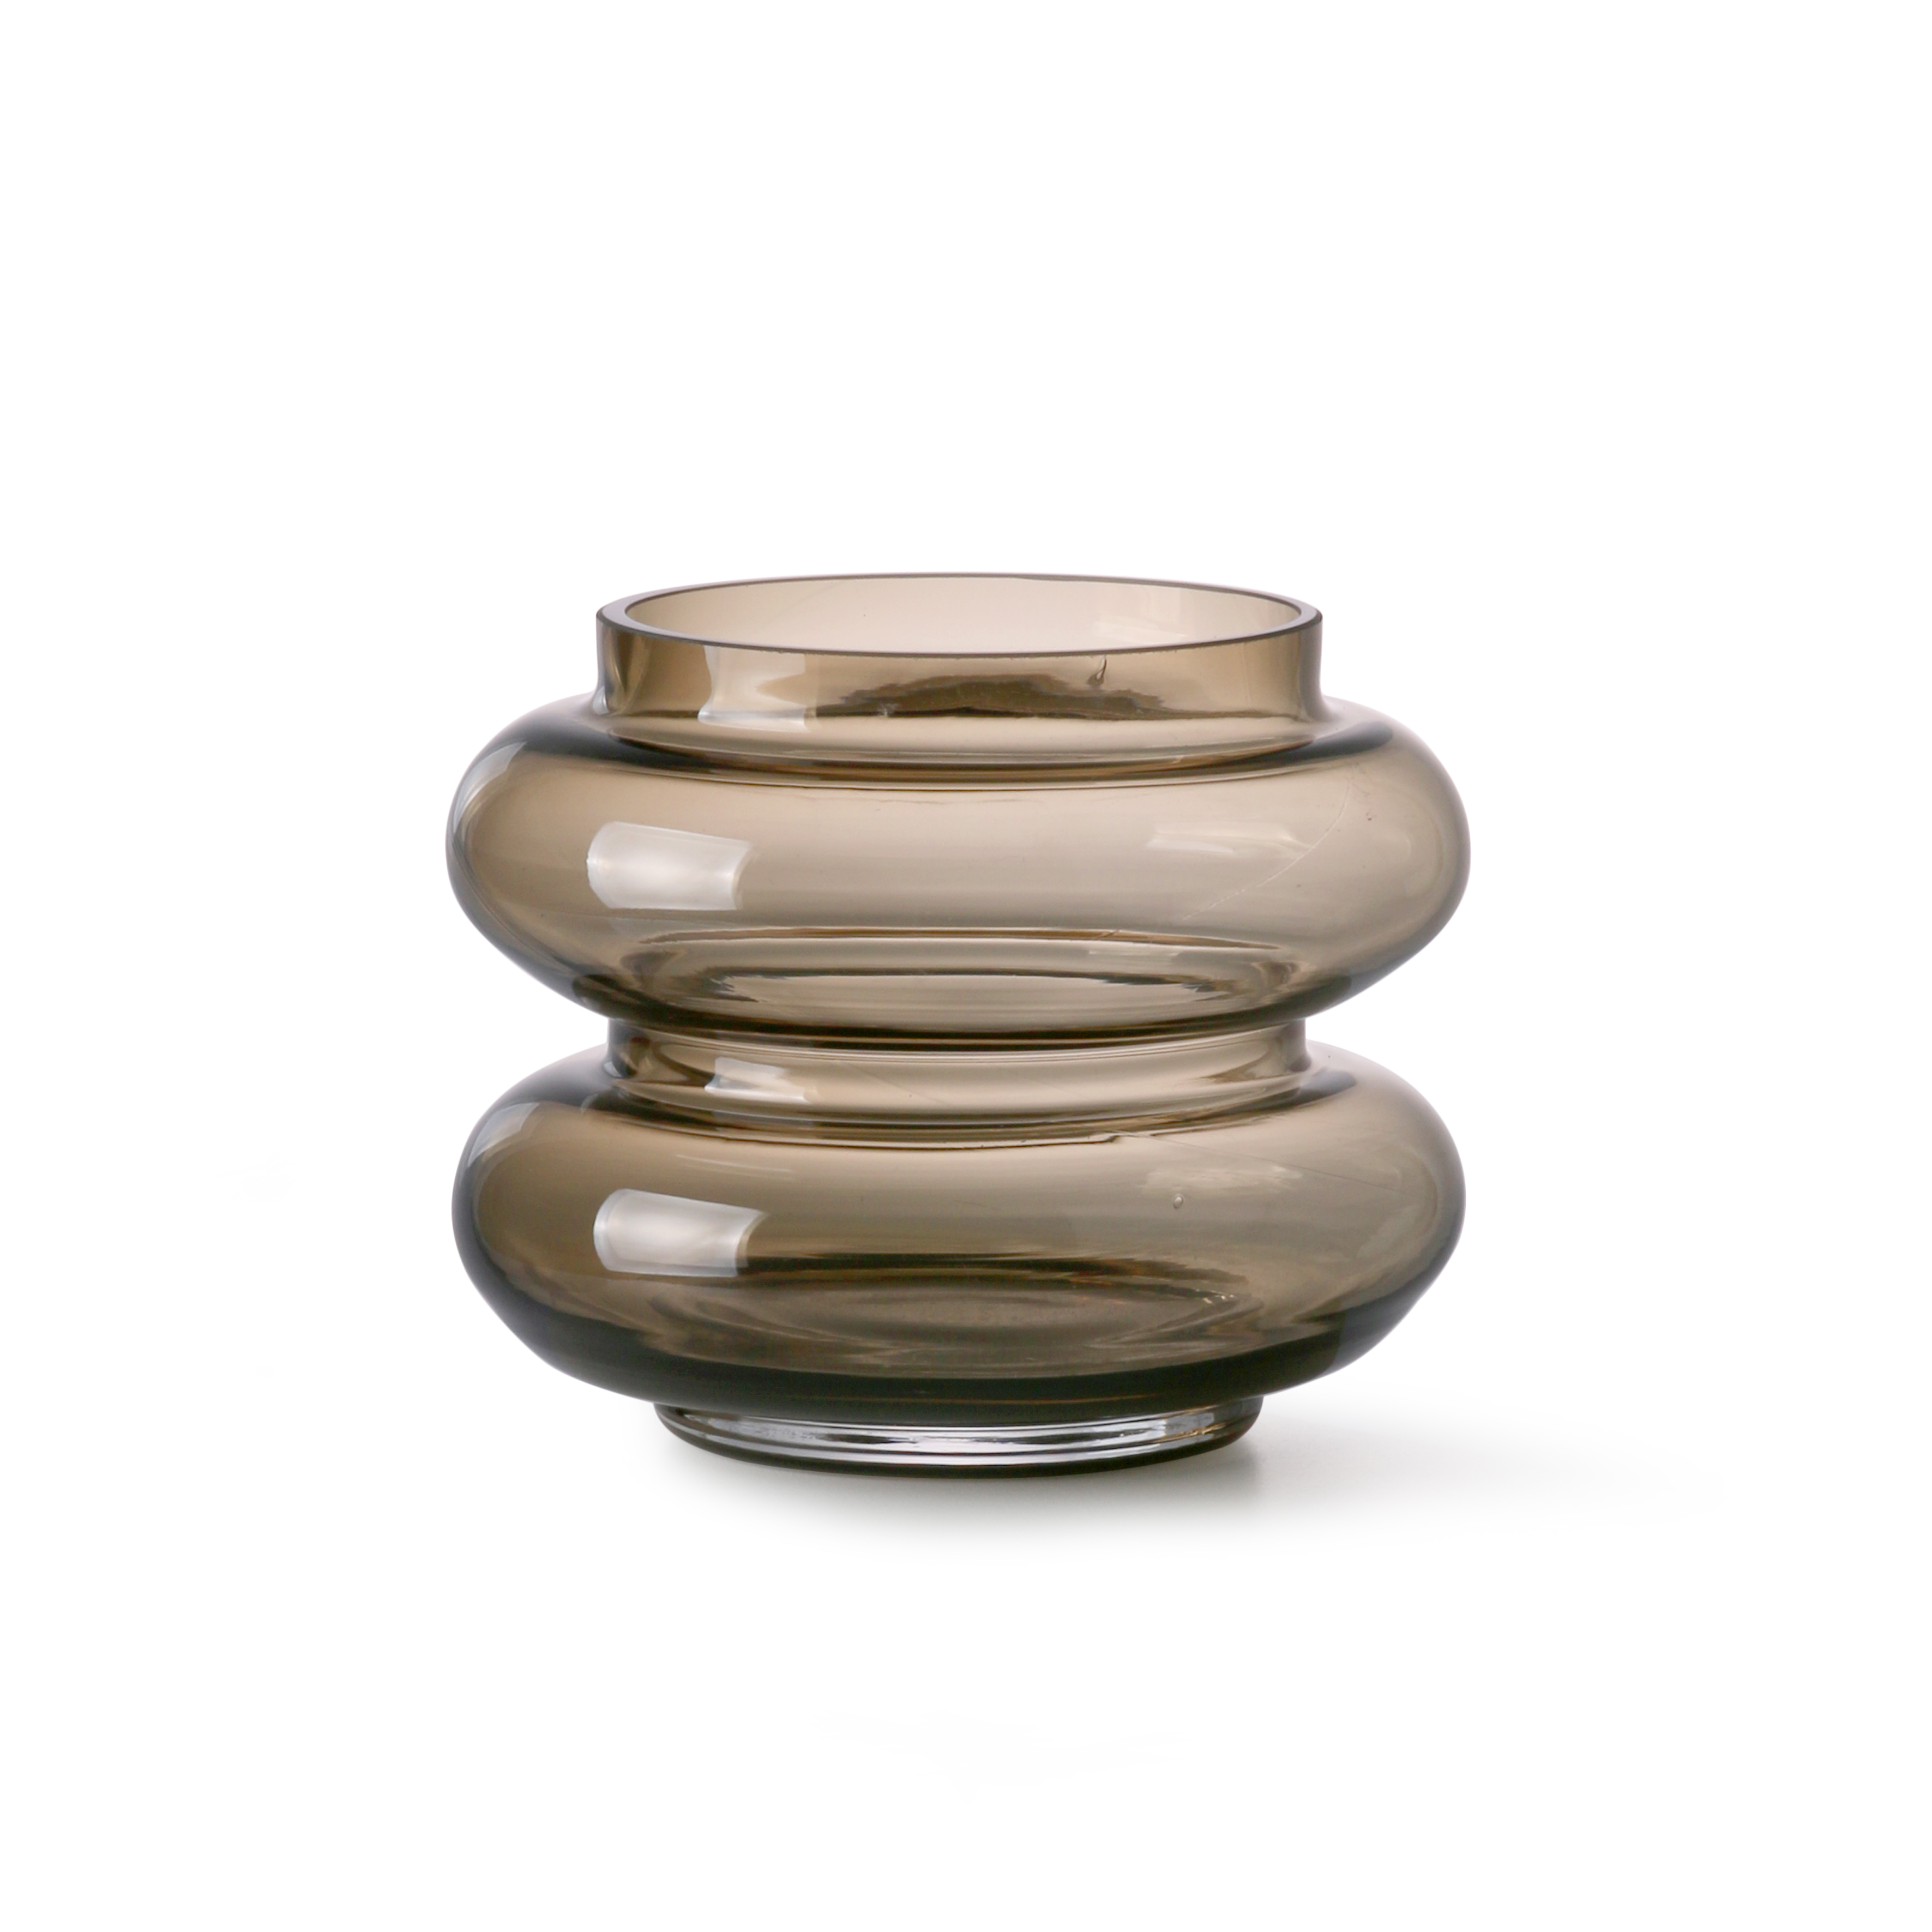 Smoked brown glass vase